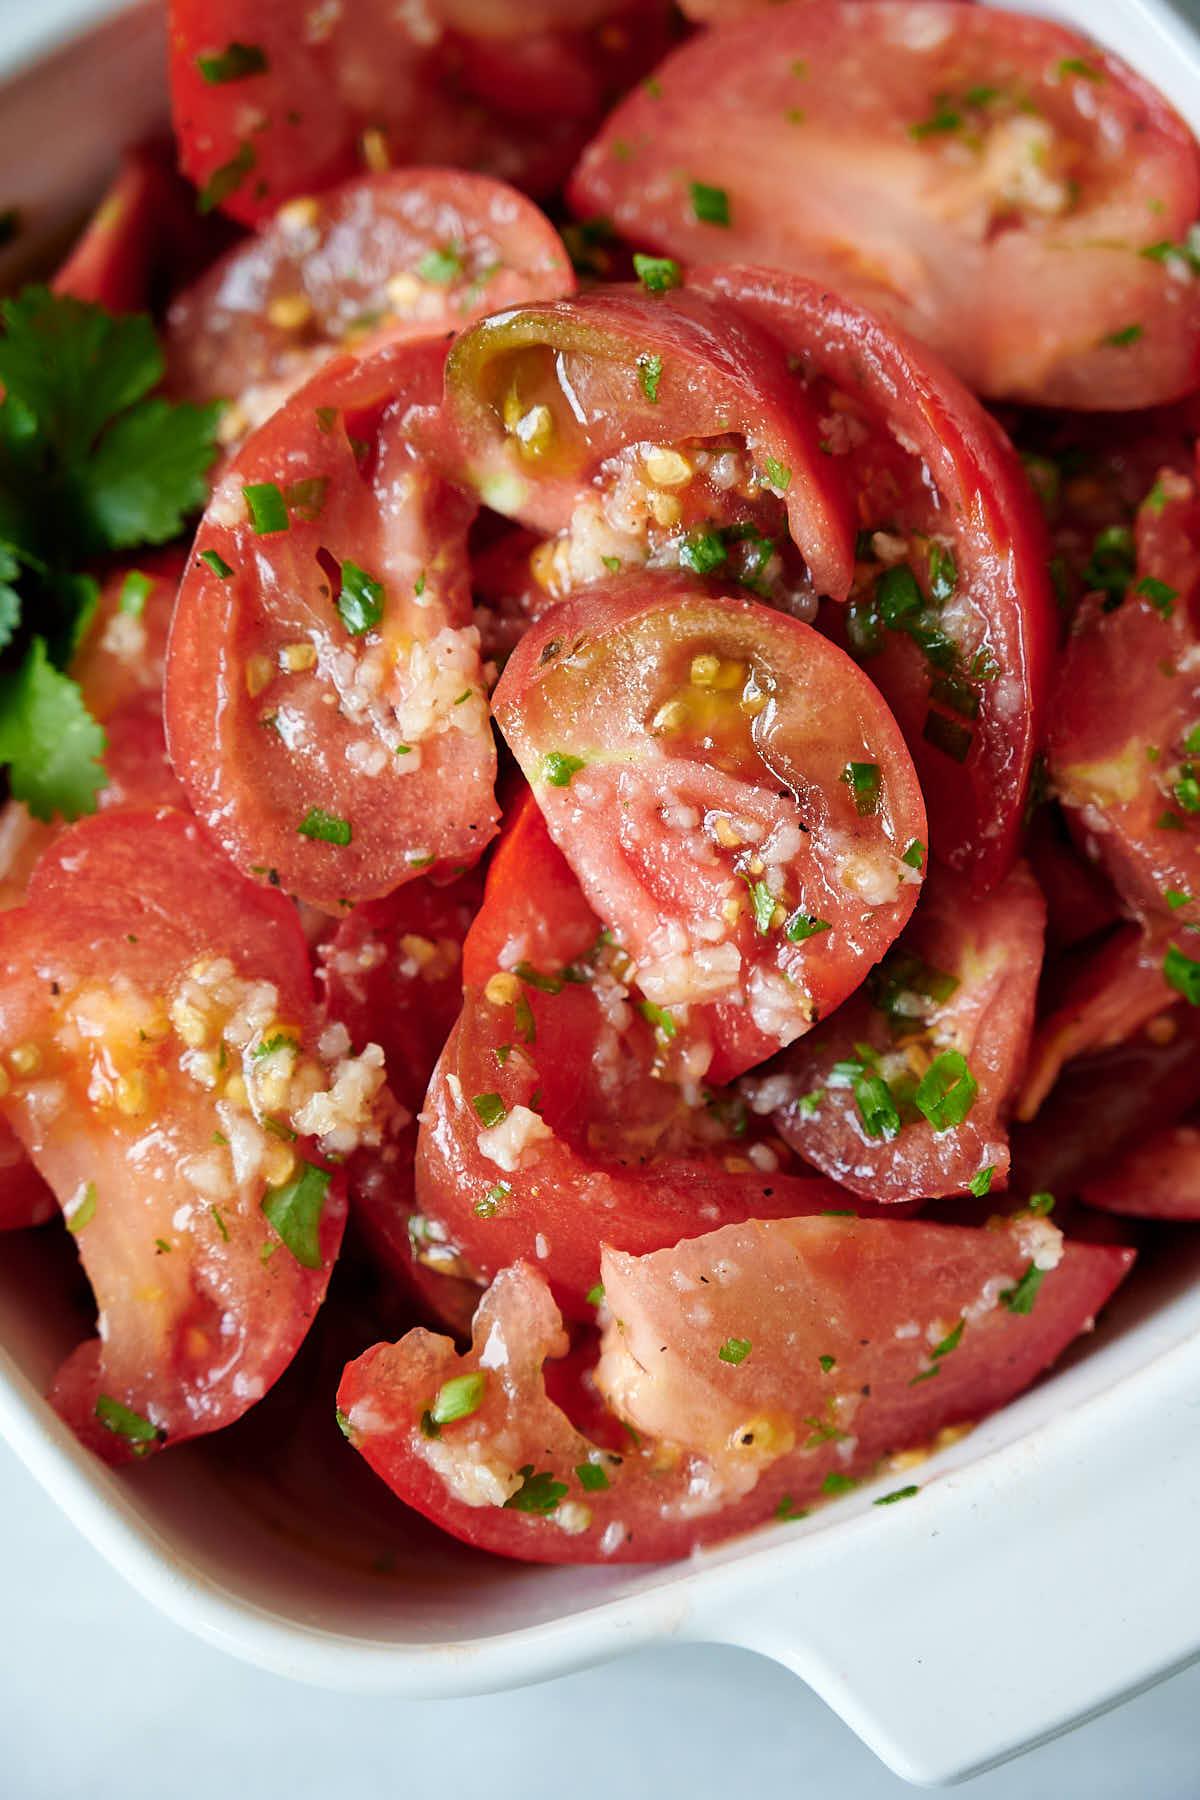 Summer tomato salad with citrus dressing